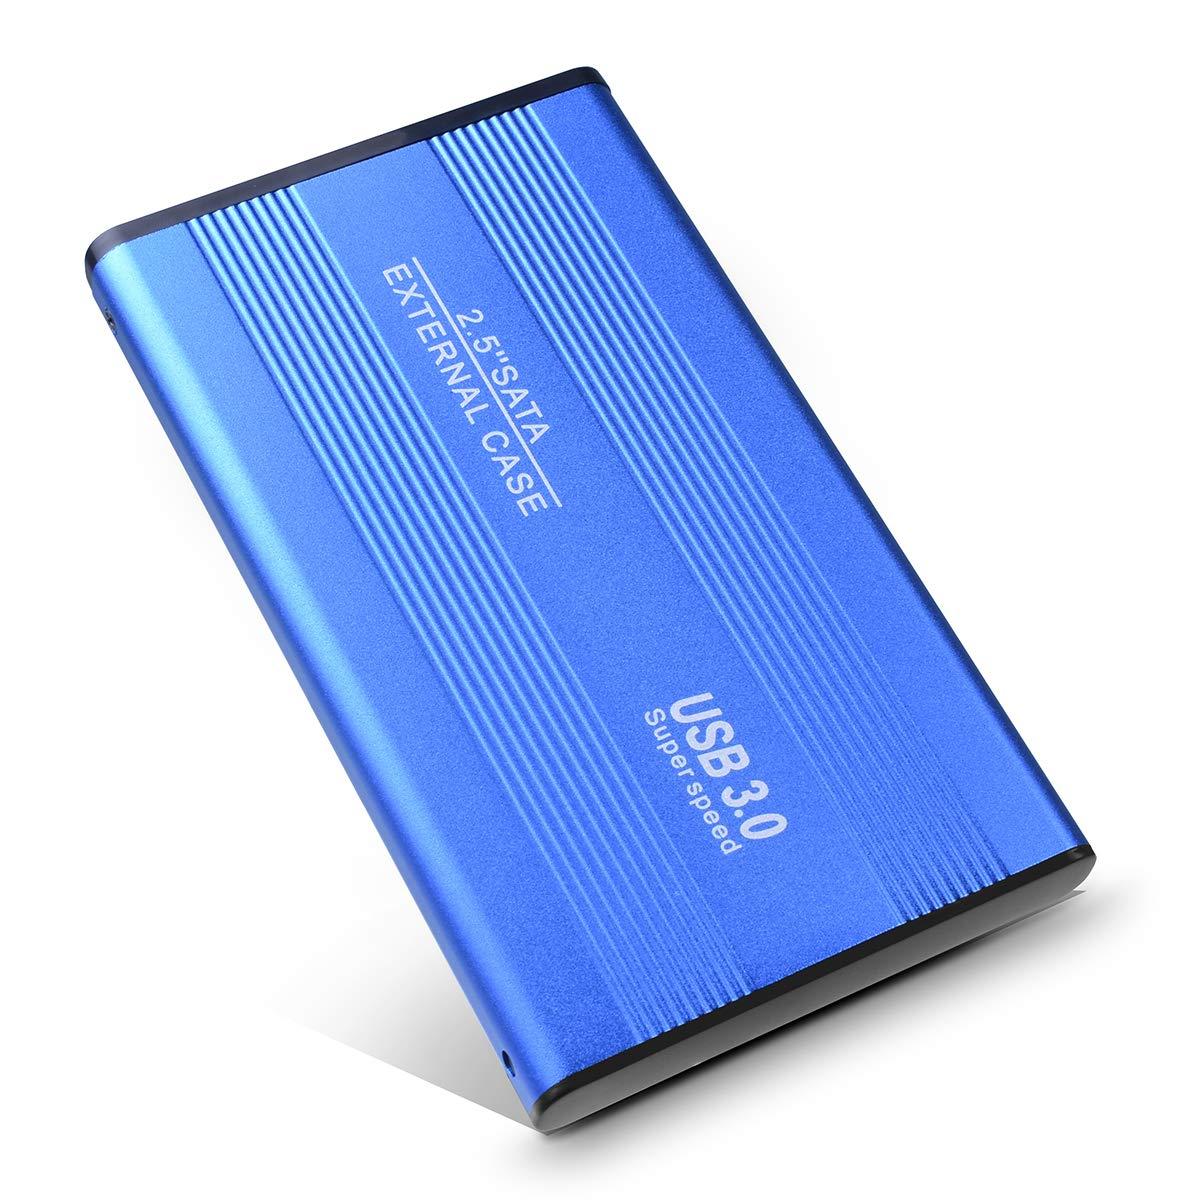 2.5'' 1TB Ultra Slim Portable External Hard Drive USB 3.0 HDD Storage for PC/Desktop/Laptop/MacBook/Chromebook (Blue,2TB)